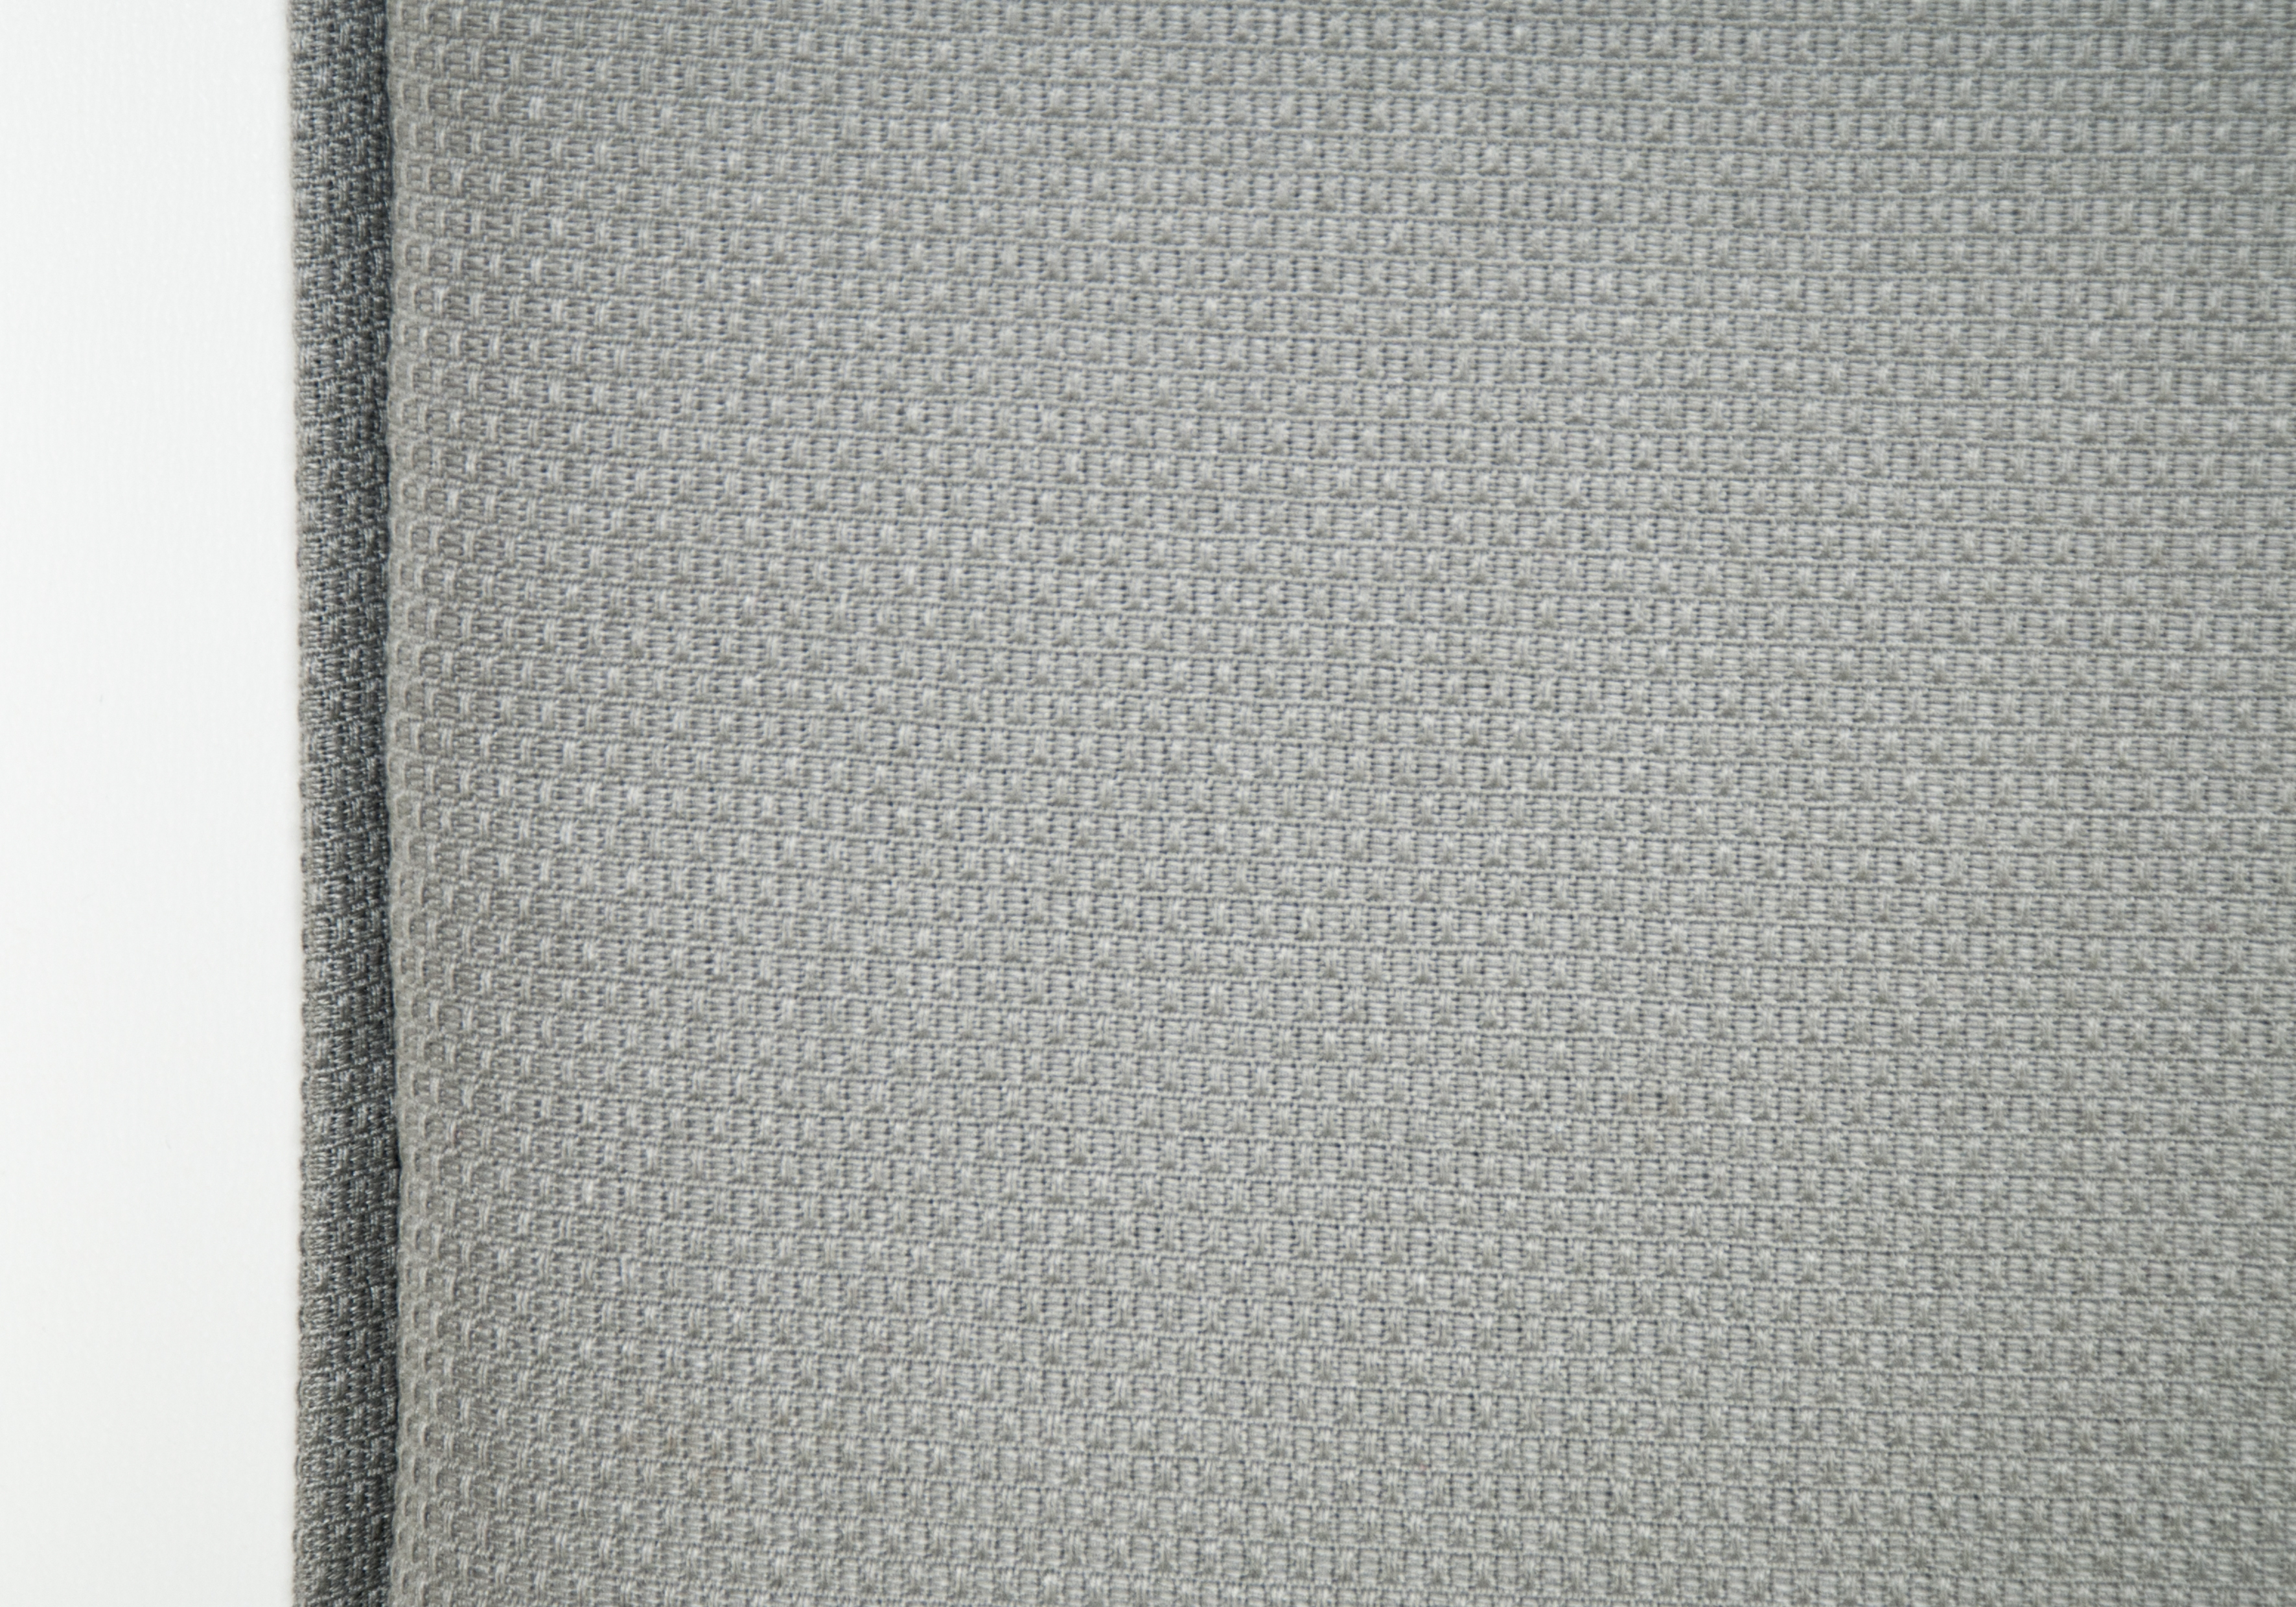 STAR 7027 - polstr na zahradní lehátko s podhlavníkem